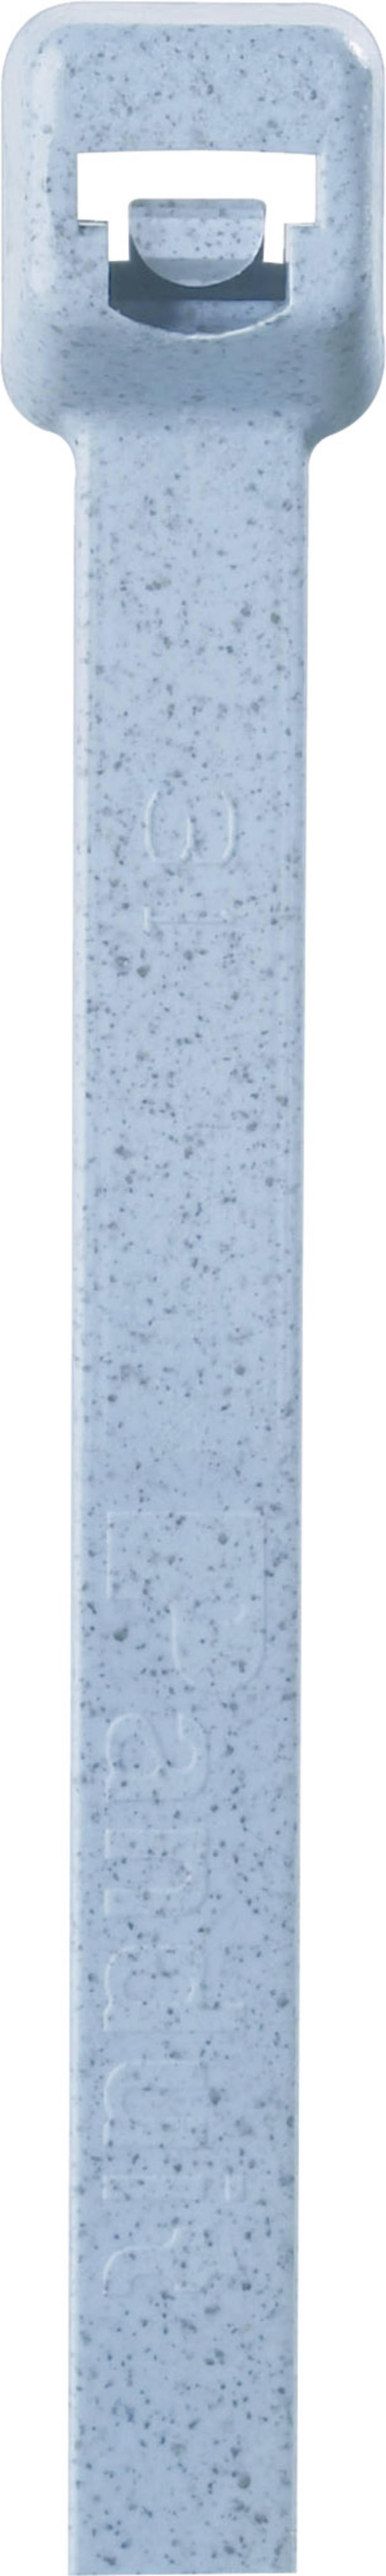 Vezice za kabele 291 mm plave boje mogučnost detekcije Panduit ASTN-450 100 kom